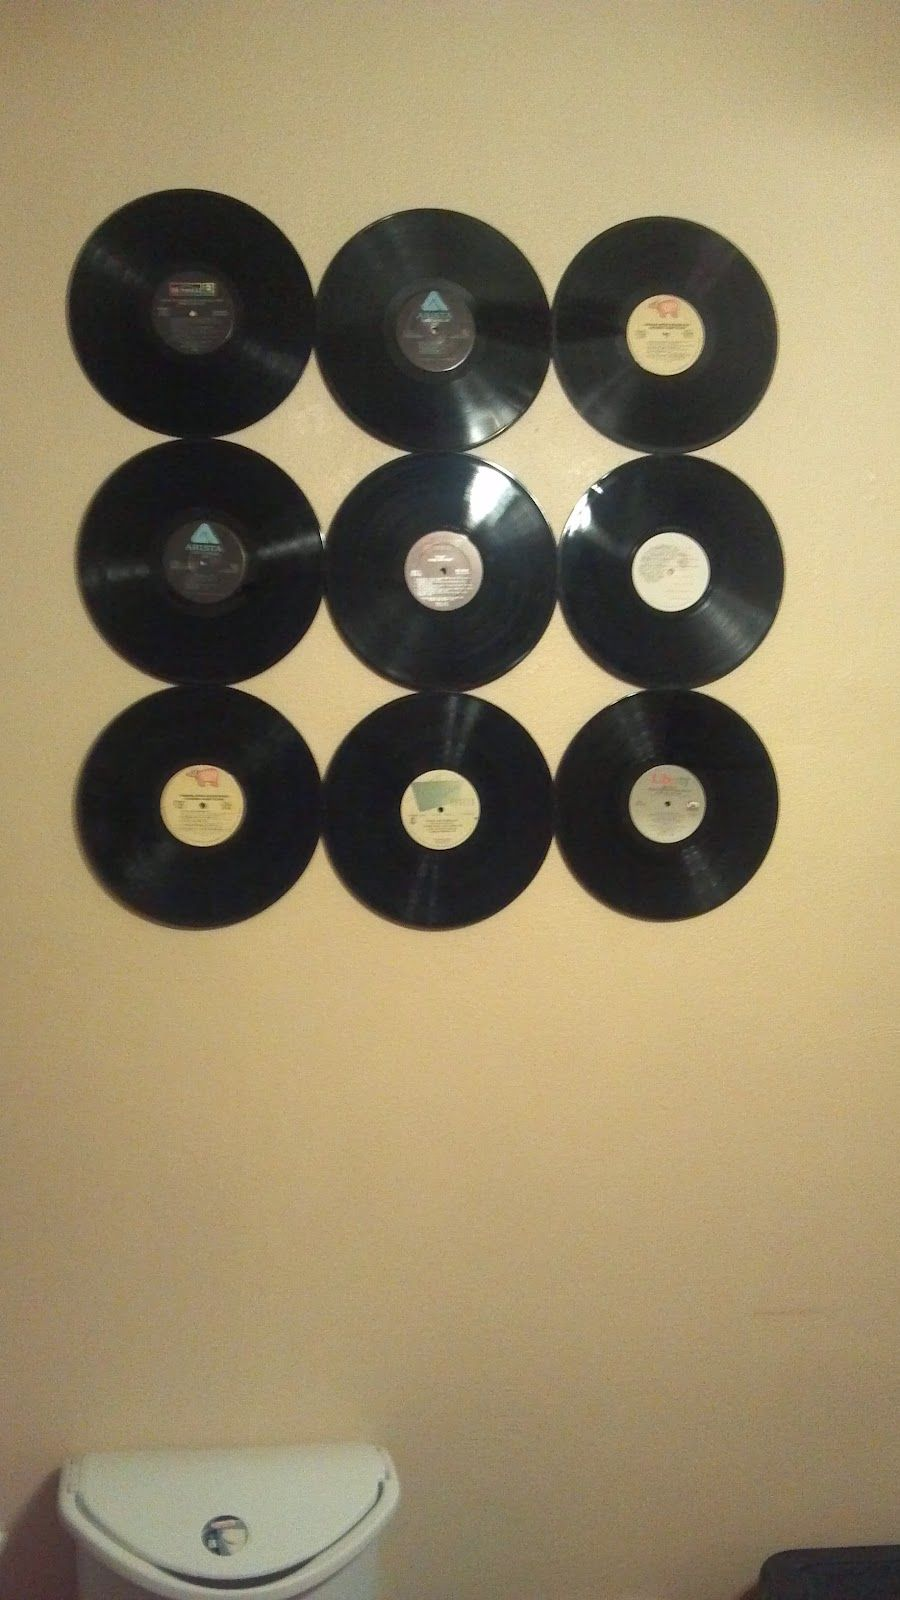 Frugal Crafting - Retro Record Wall Decor | Crafty Things ...